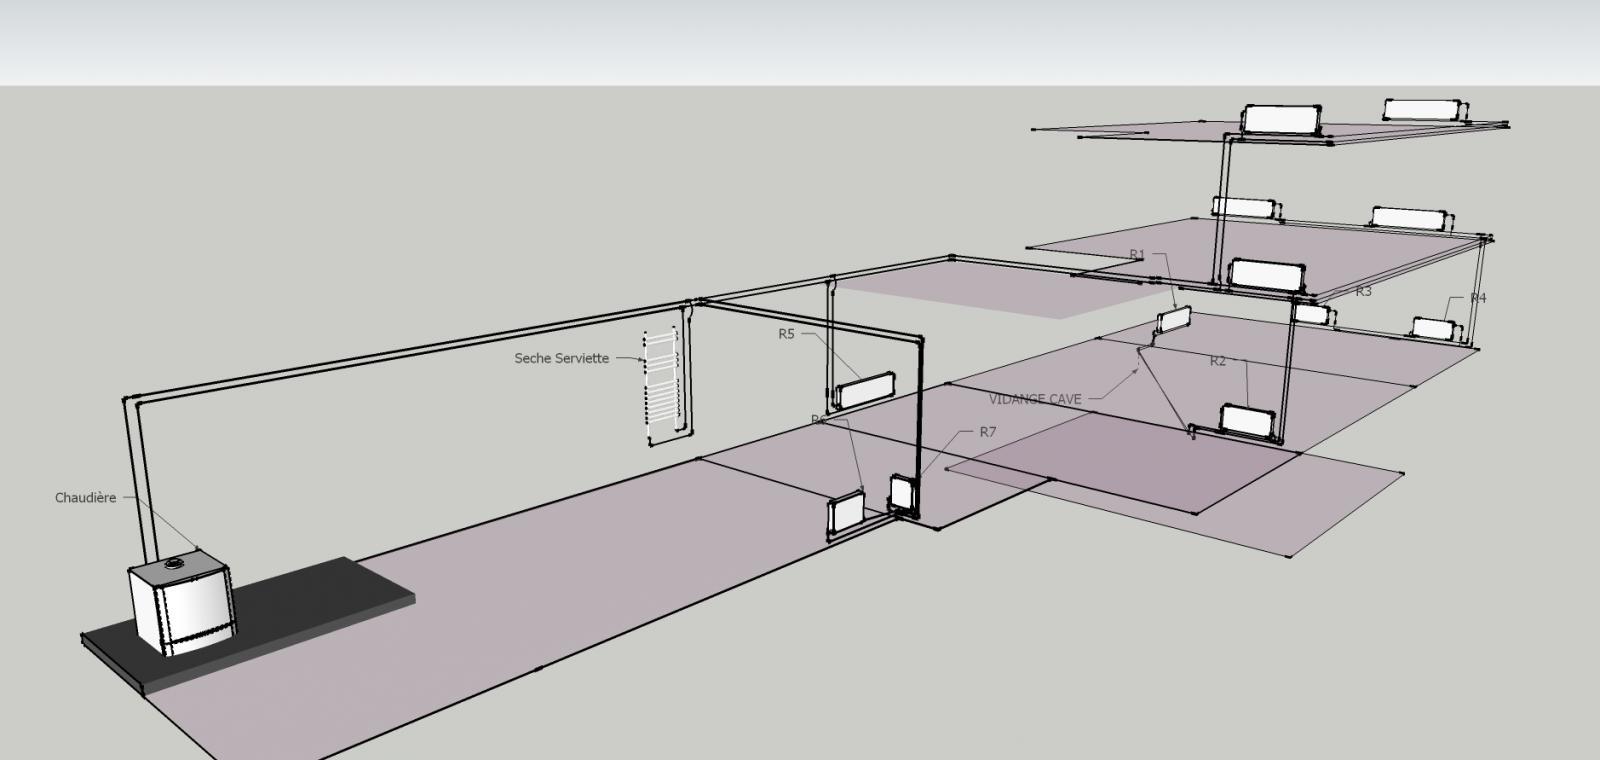 radiateur qui ne chauffe pas. Black Bedroom Furniture Sets. Home Design Ideas